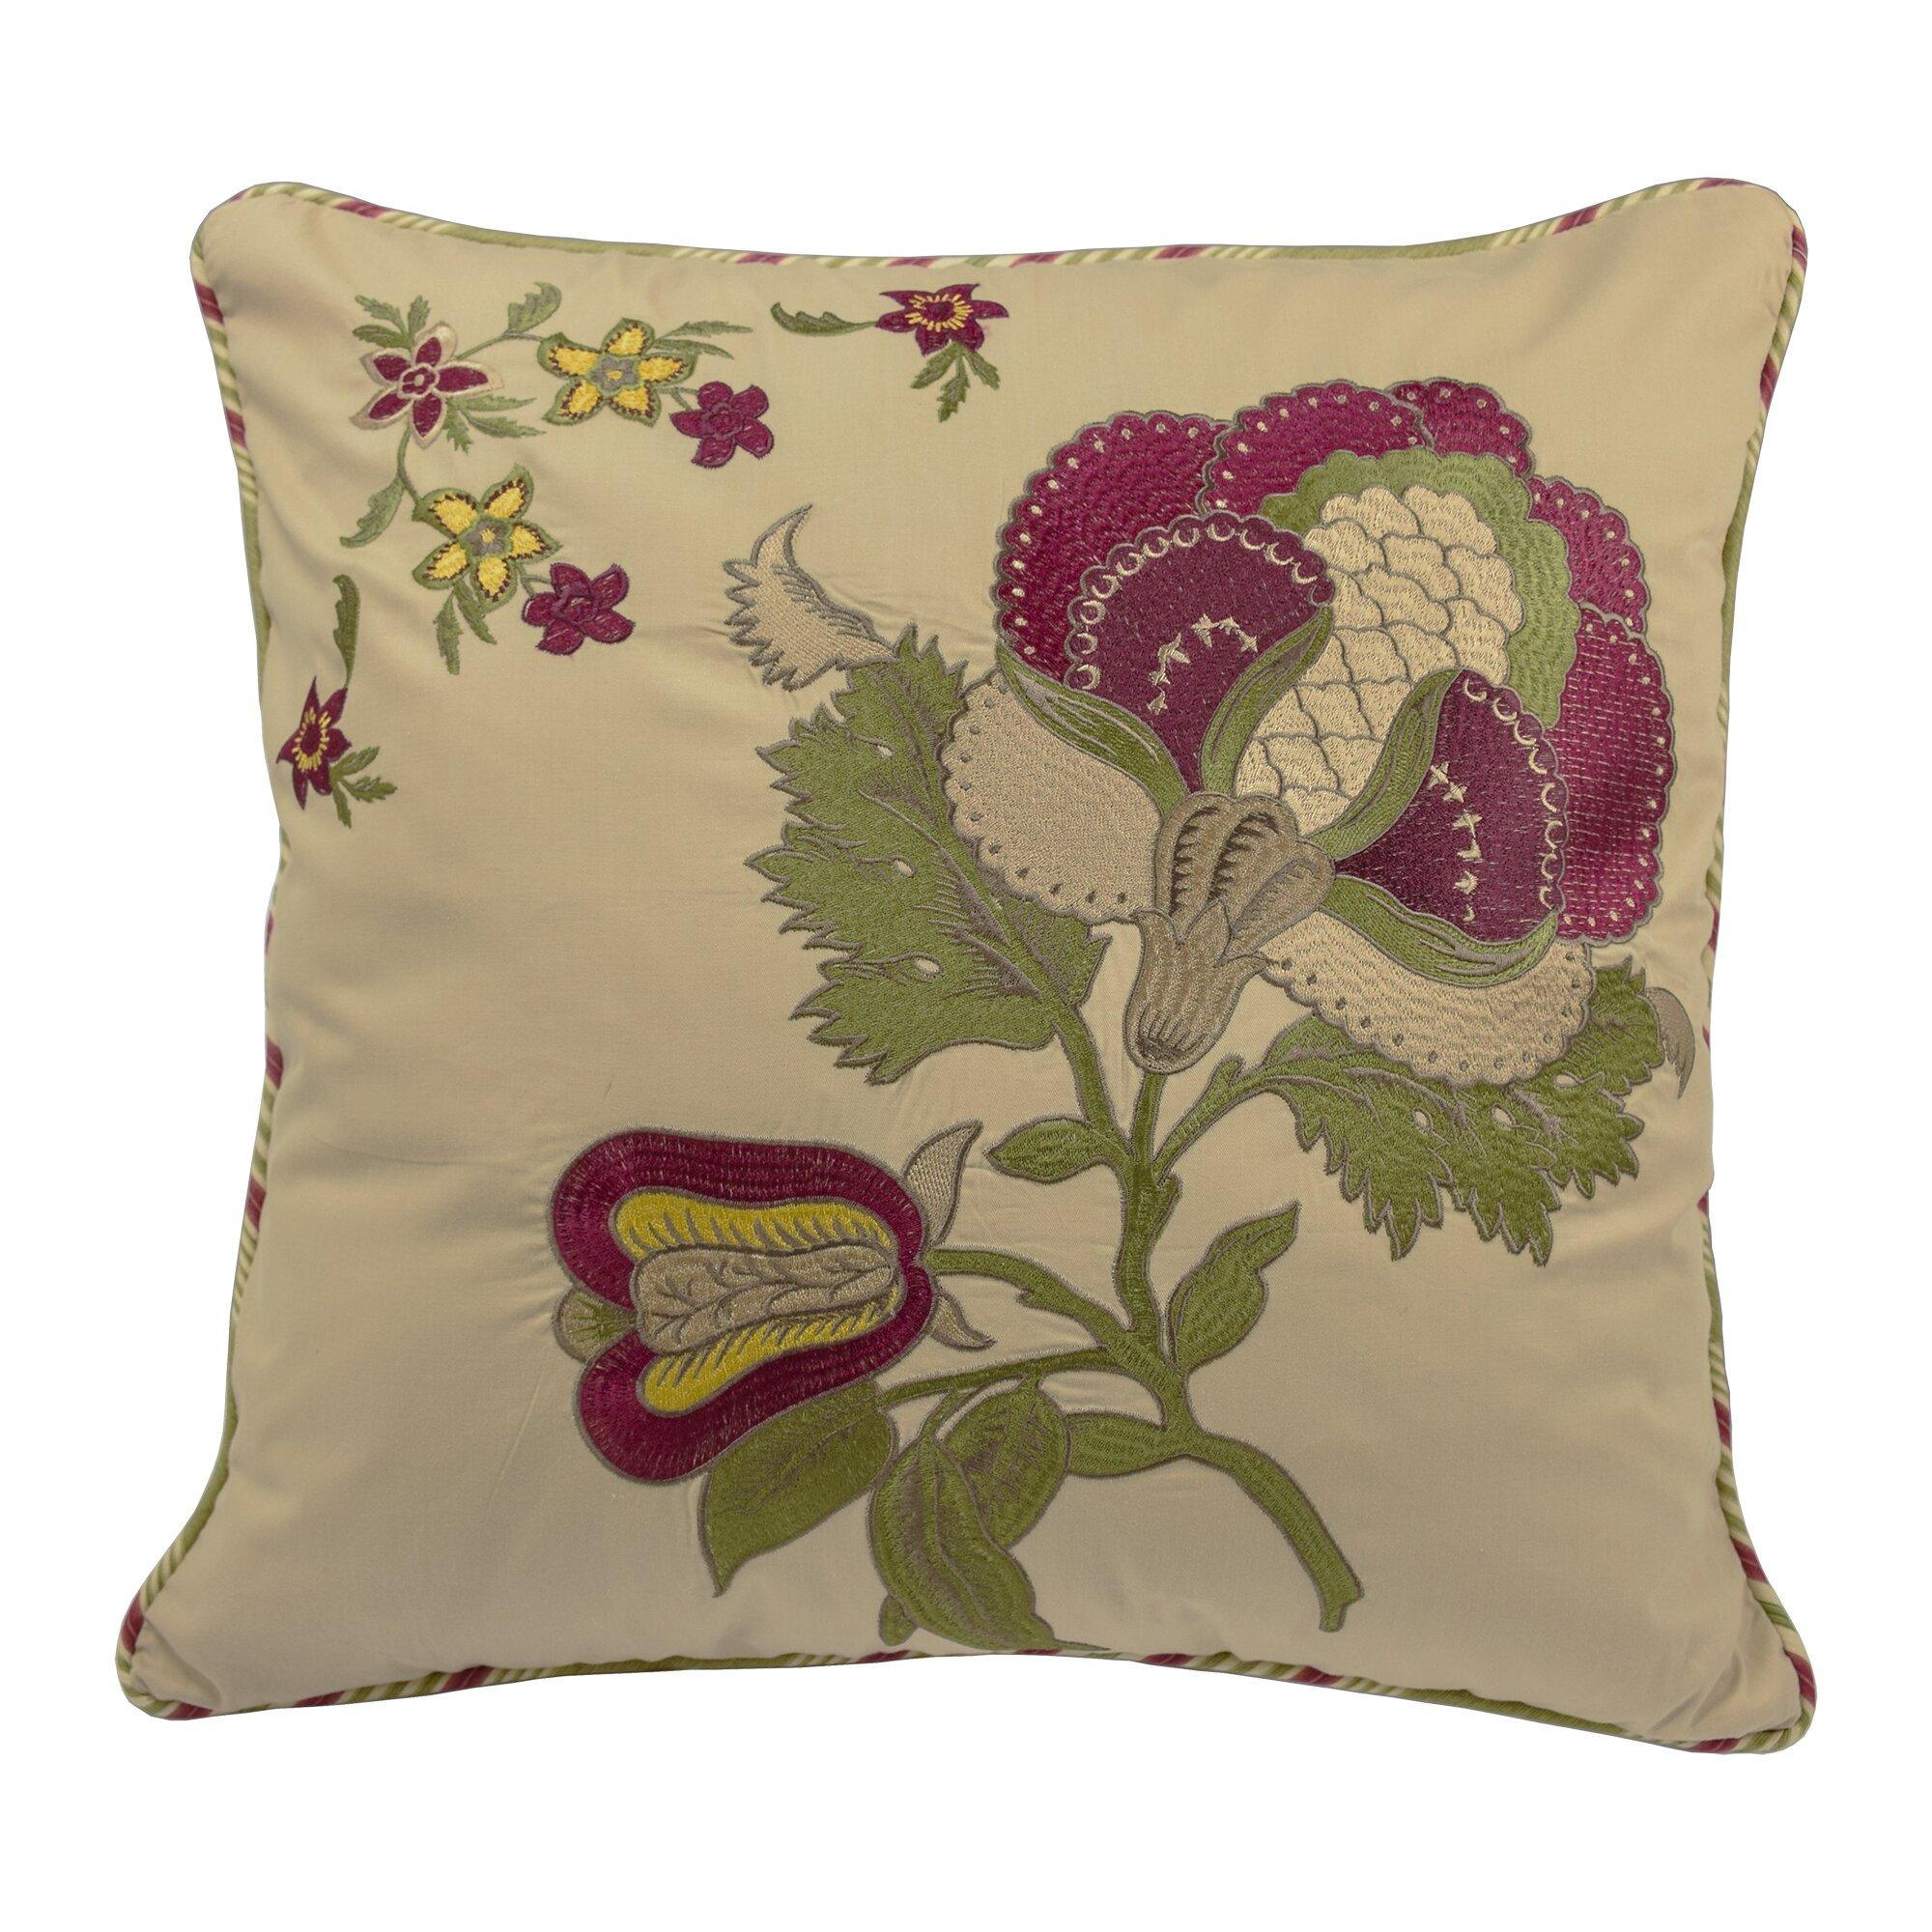 Waverly Decorative Throw Pillows : Waverly Imperial Dress Cotton Throw Pillow & Reviews Wayfair.ca